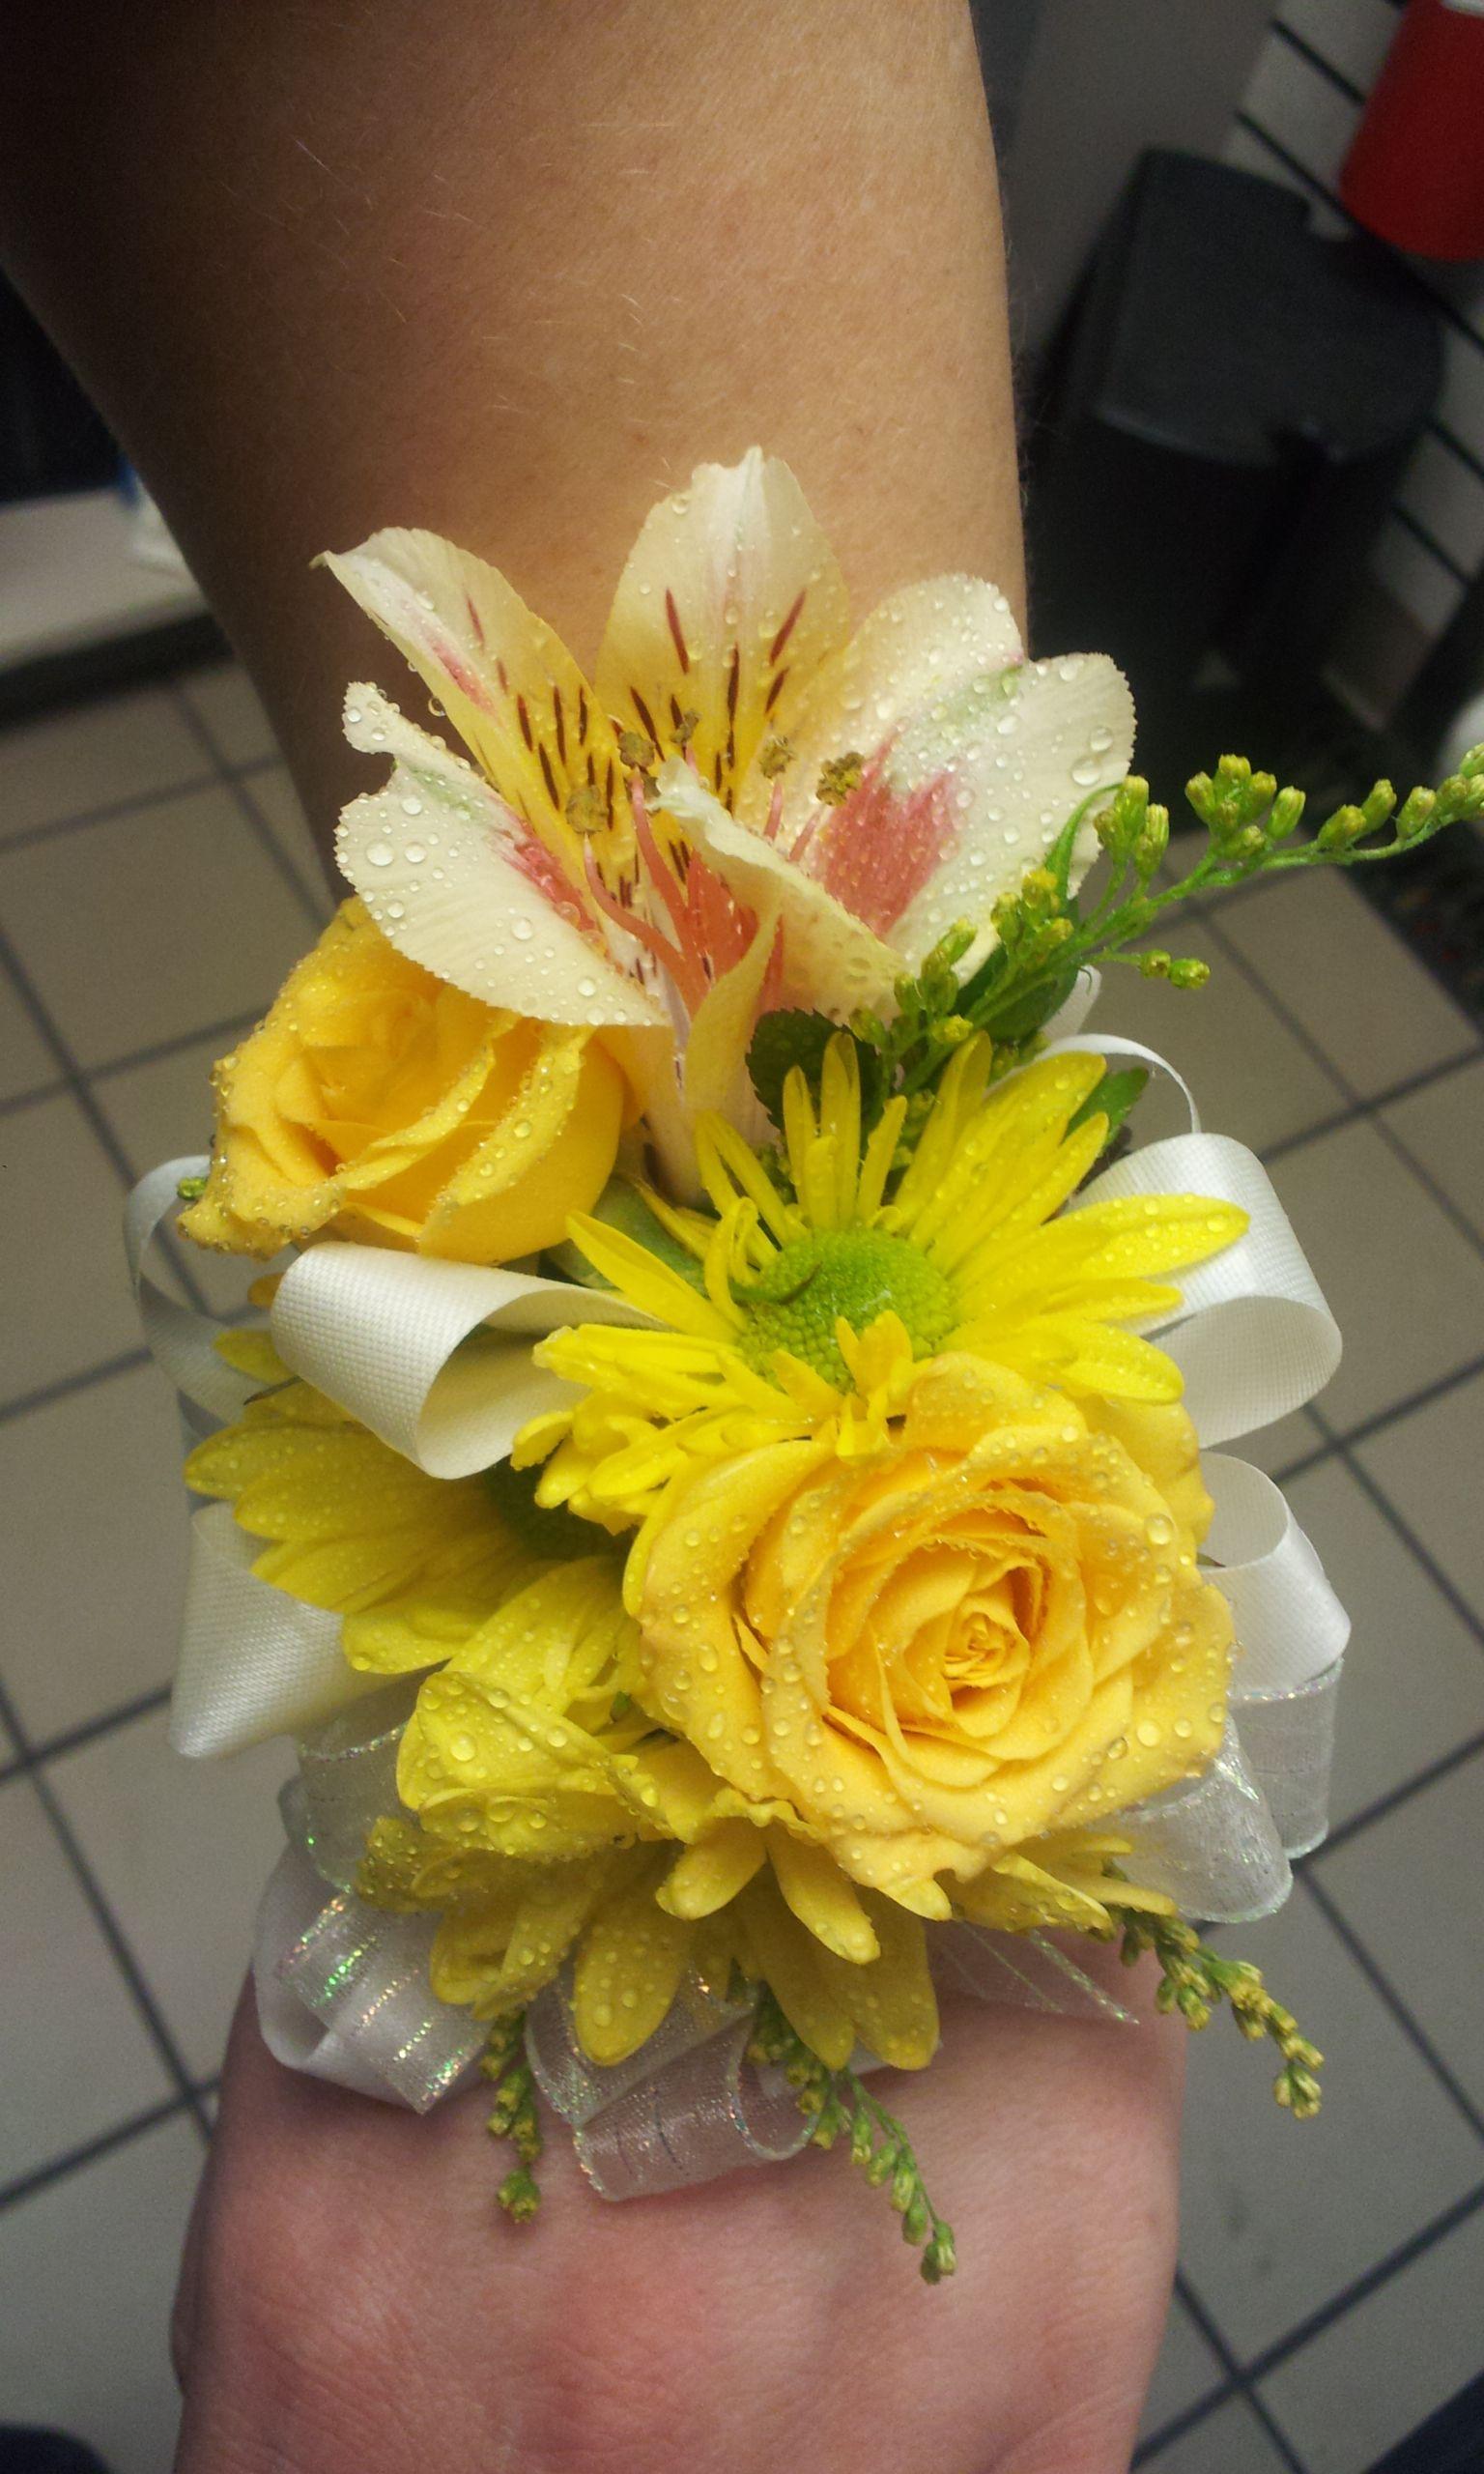 Yellow Daisy Spray Rose And Alstroemeria Wrist Corsage Again Love